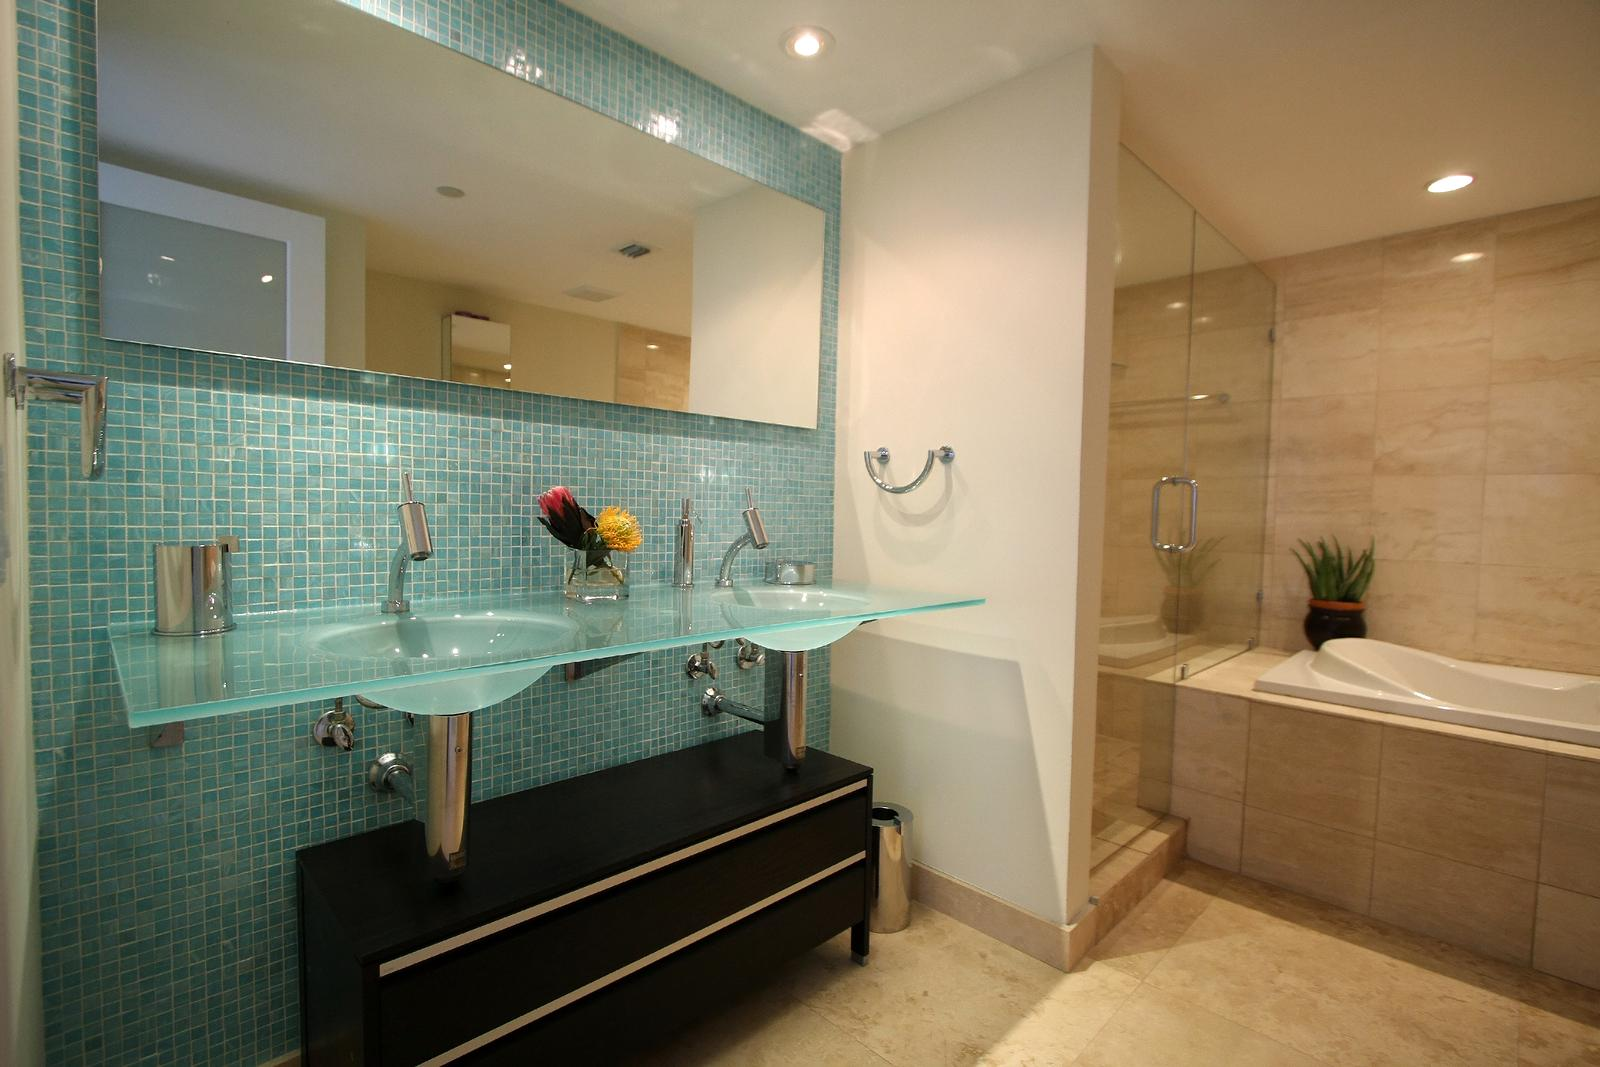 Bathroom Remodeling In Allentwon PA - Allentown bathroom remodeling